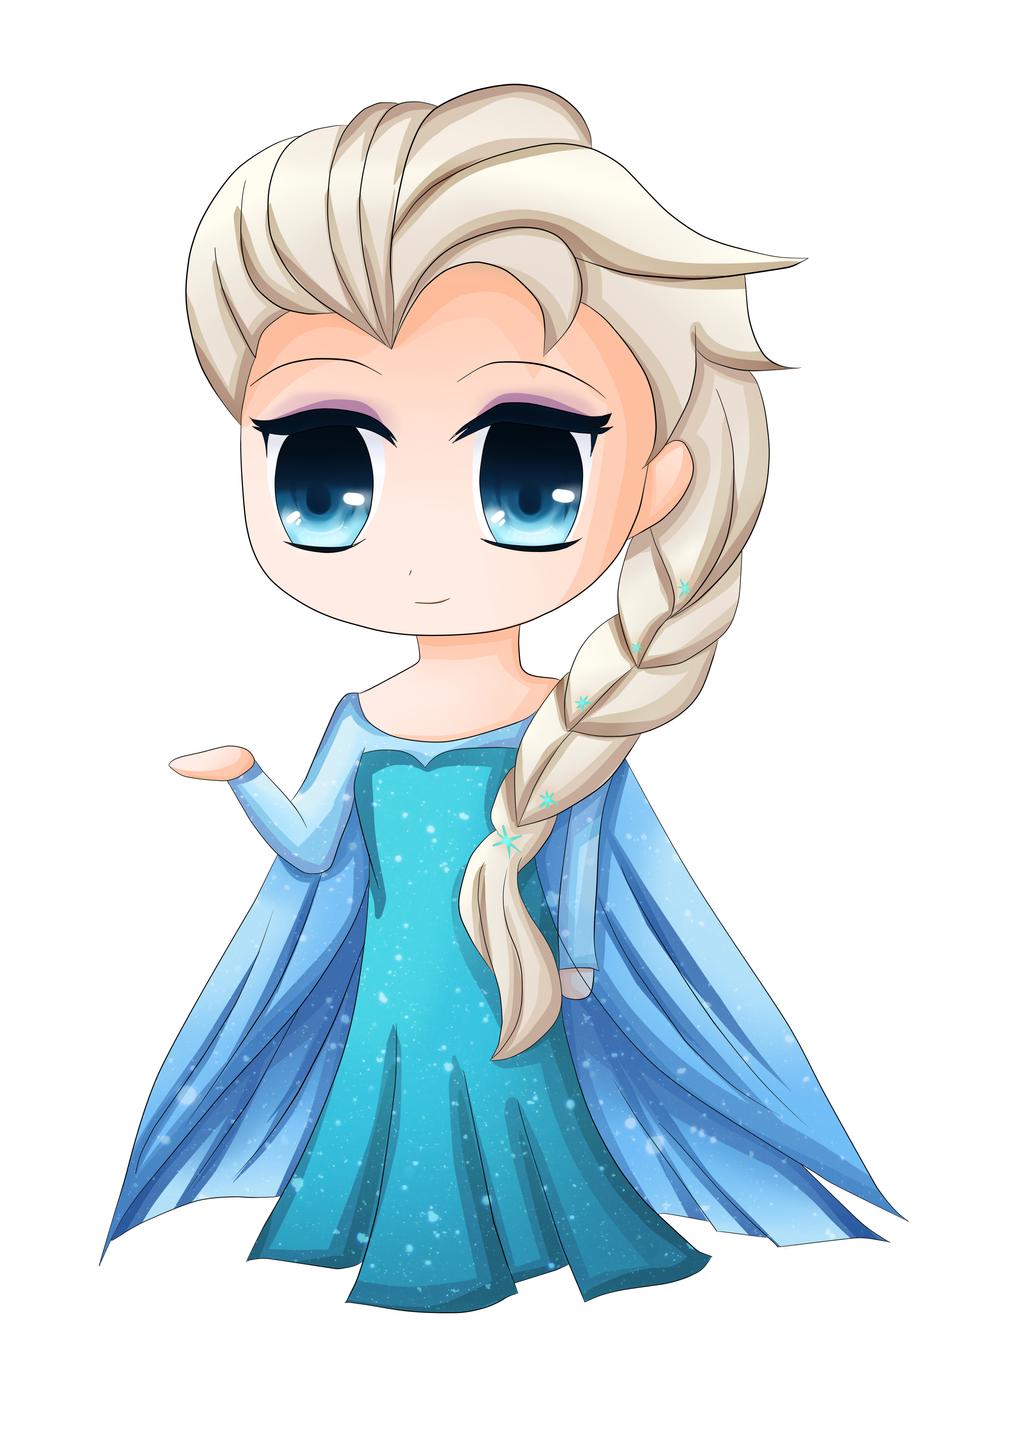 Elsa (Frozen) by shinyskymin on DeviantArt